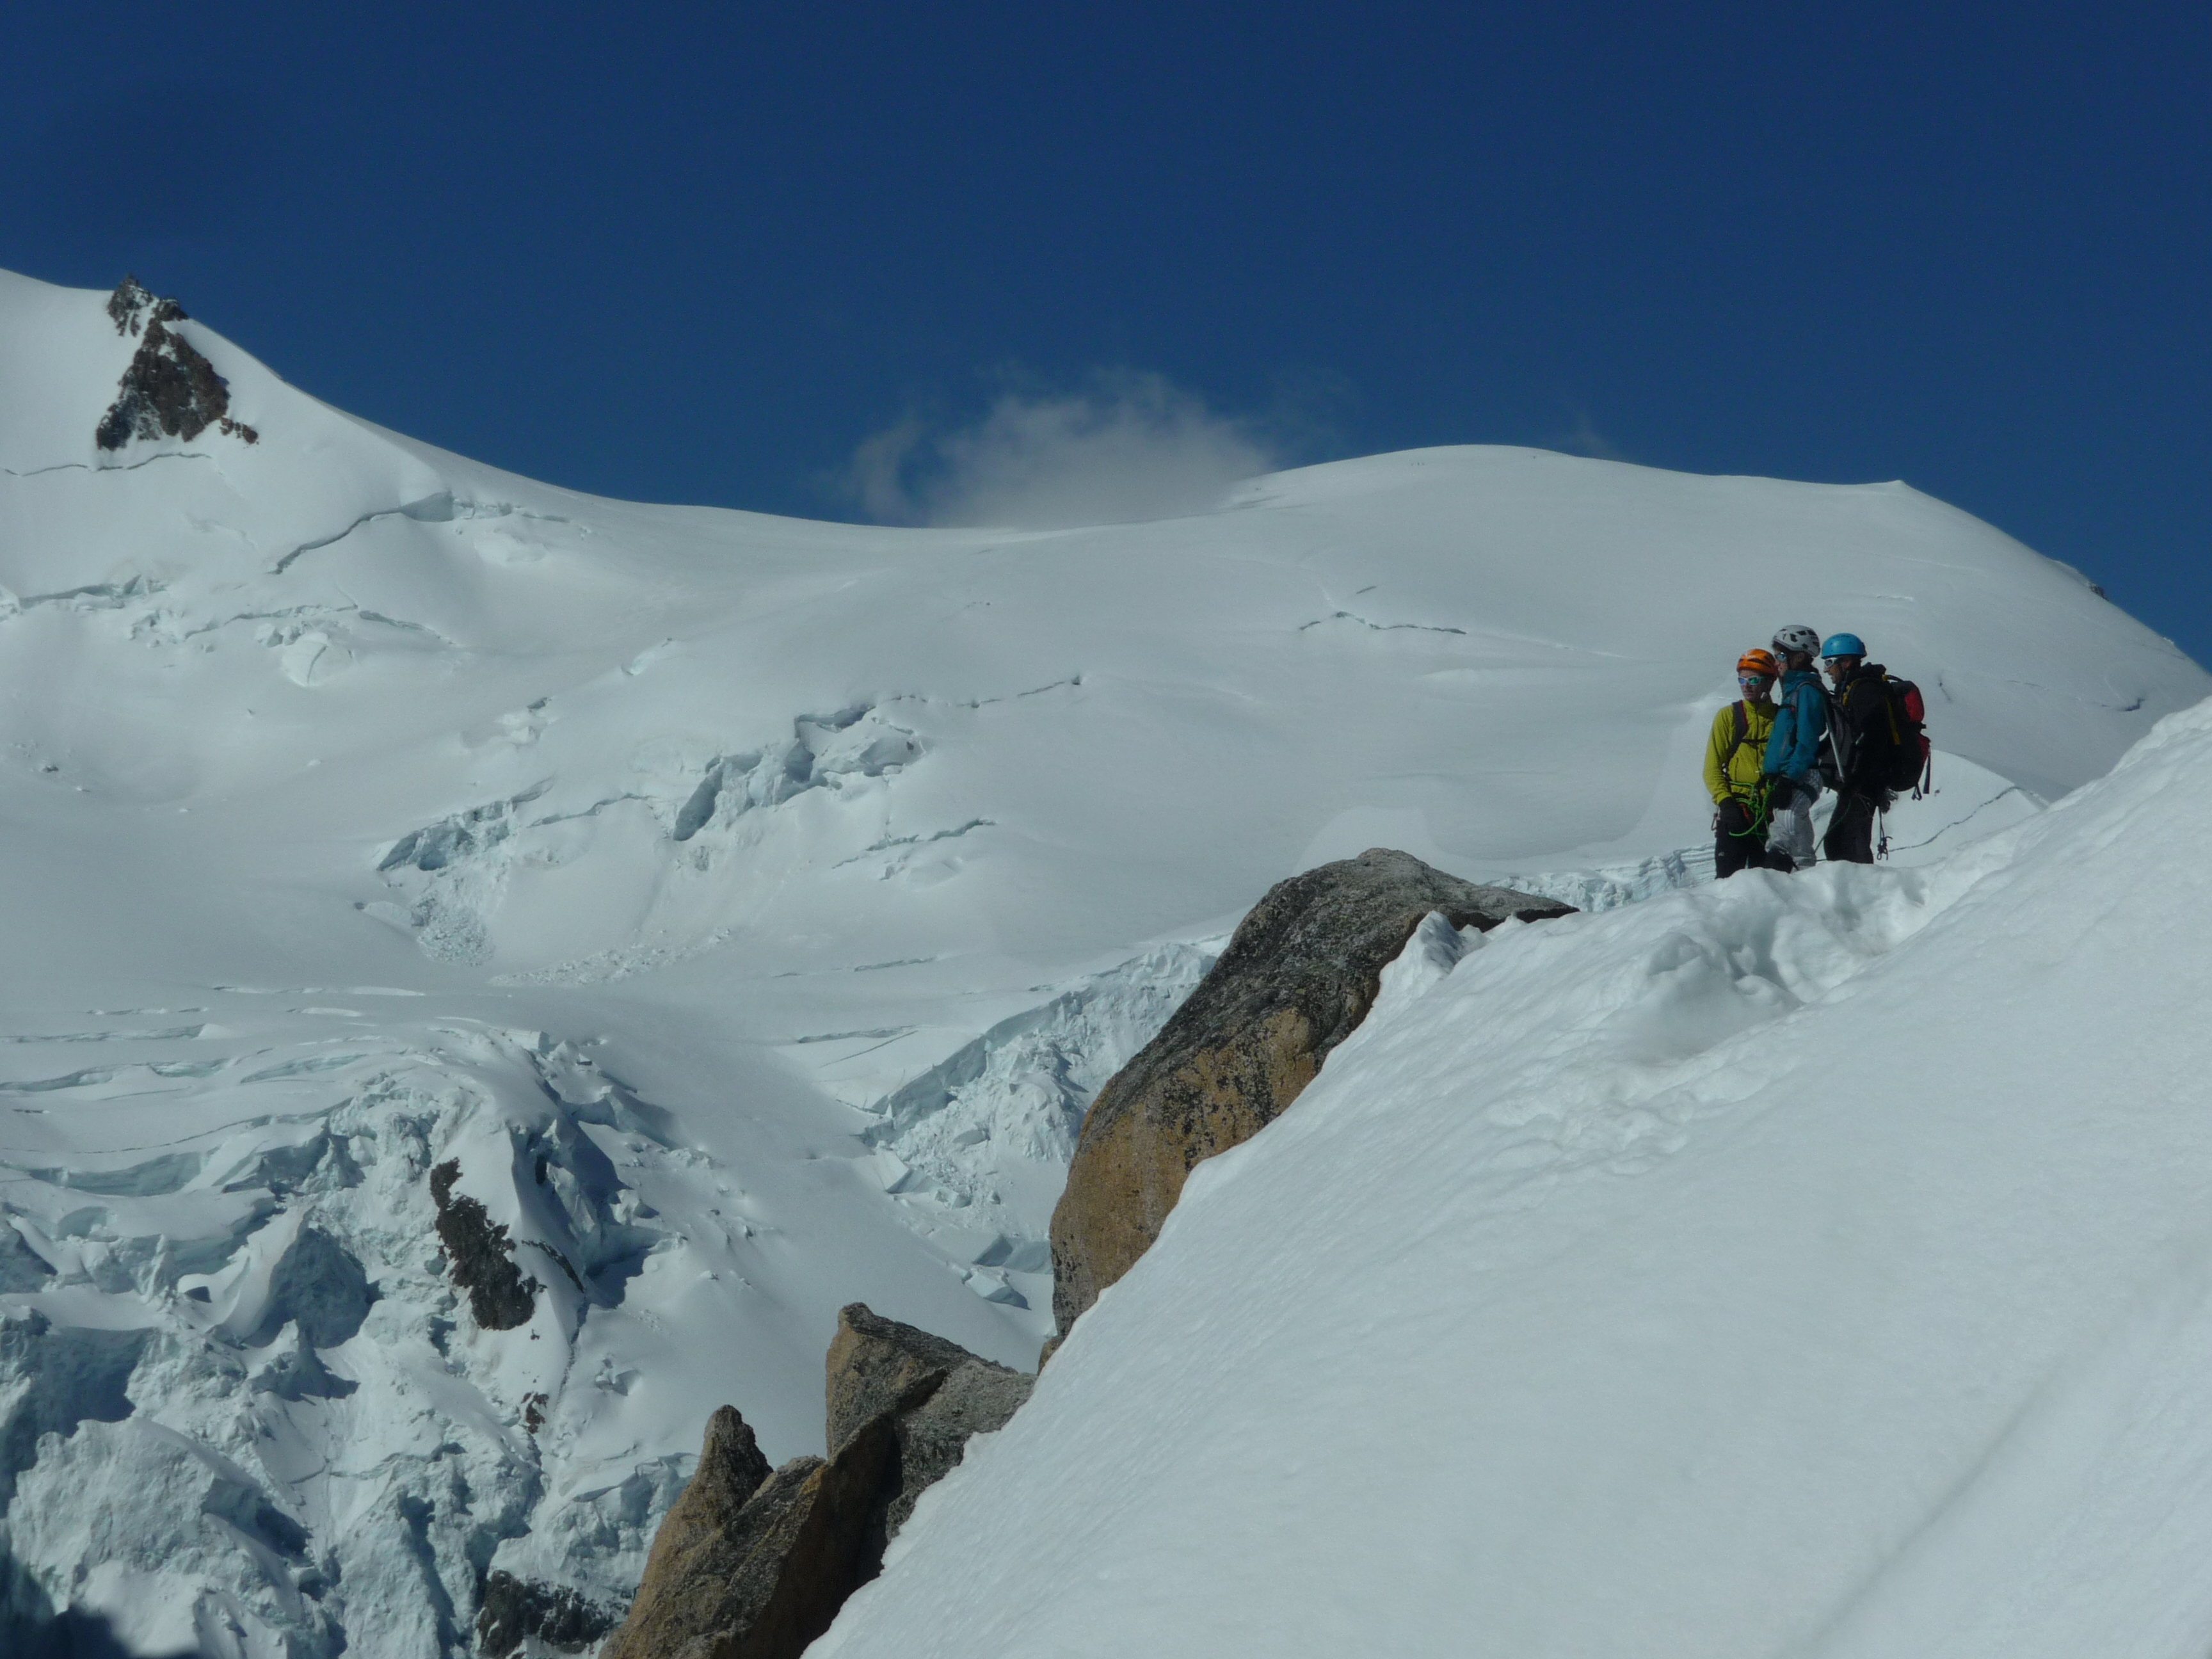 randonnee alpinisme mont blanc